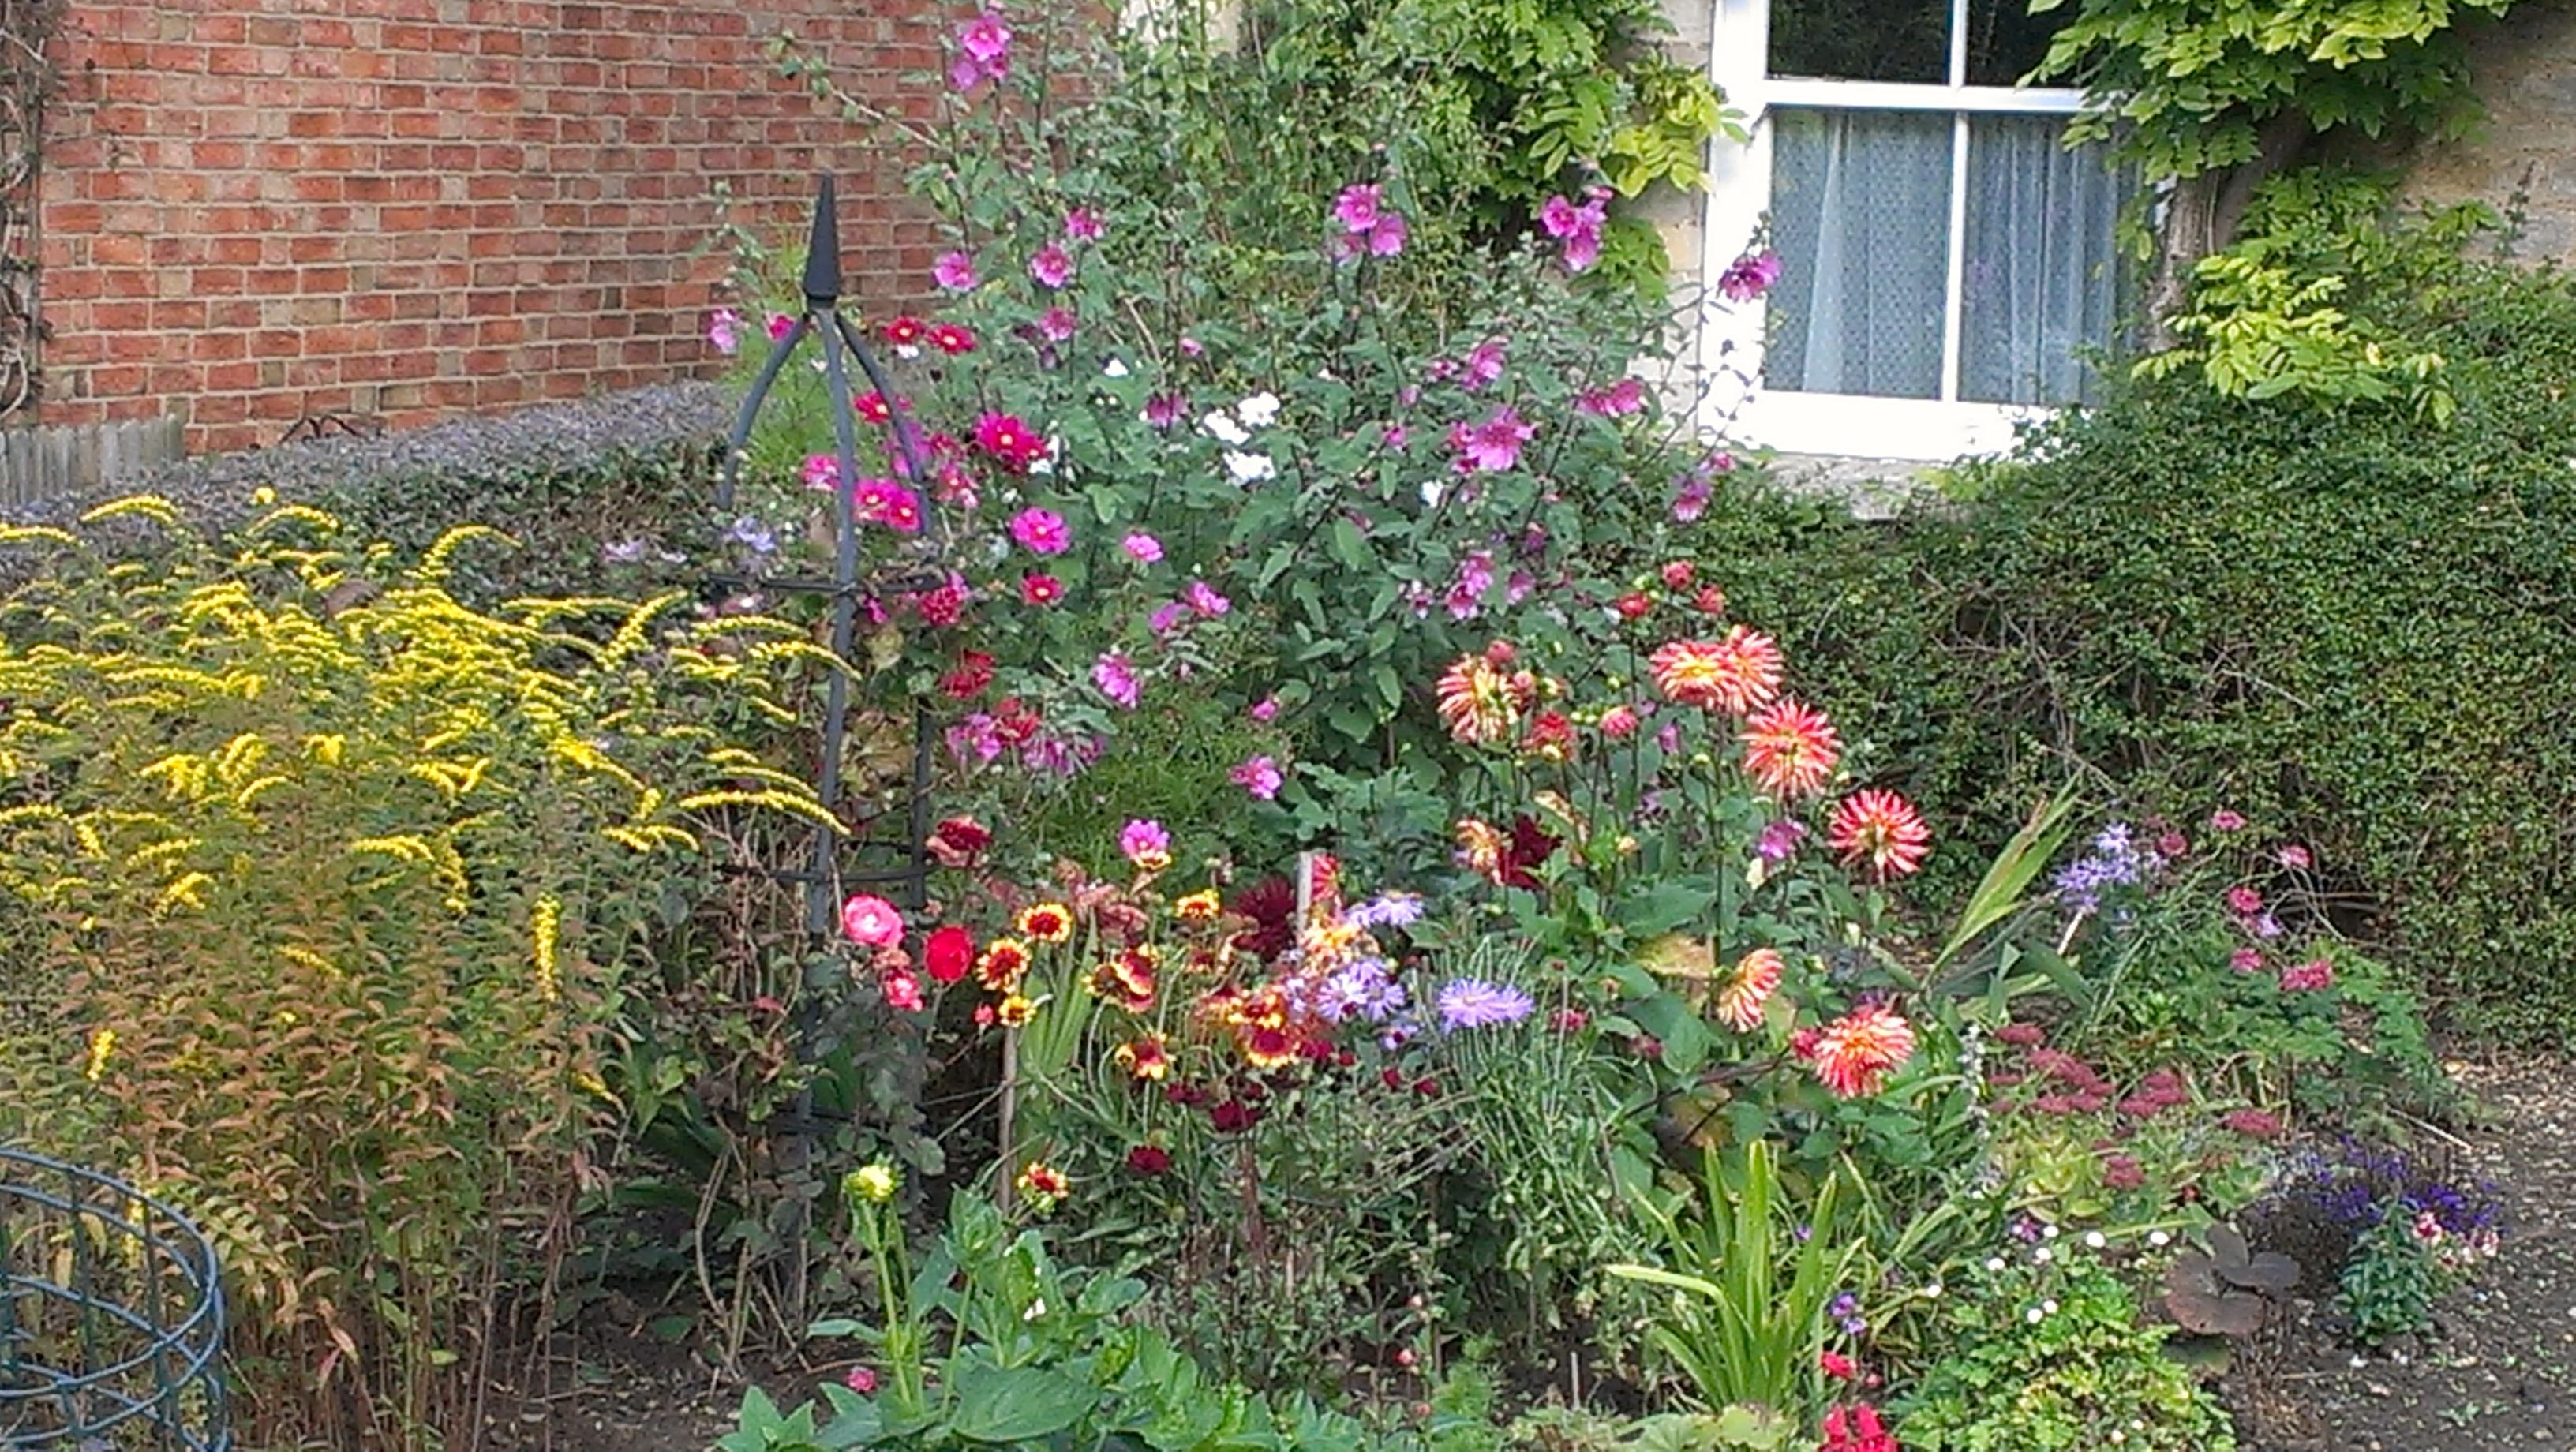 Graham's front garden